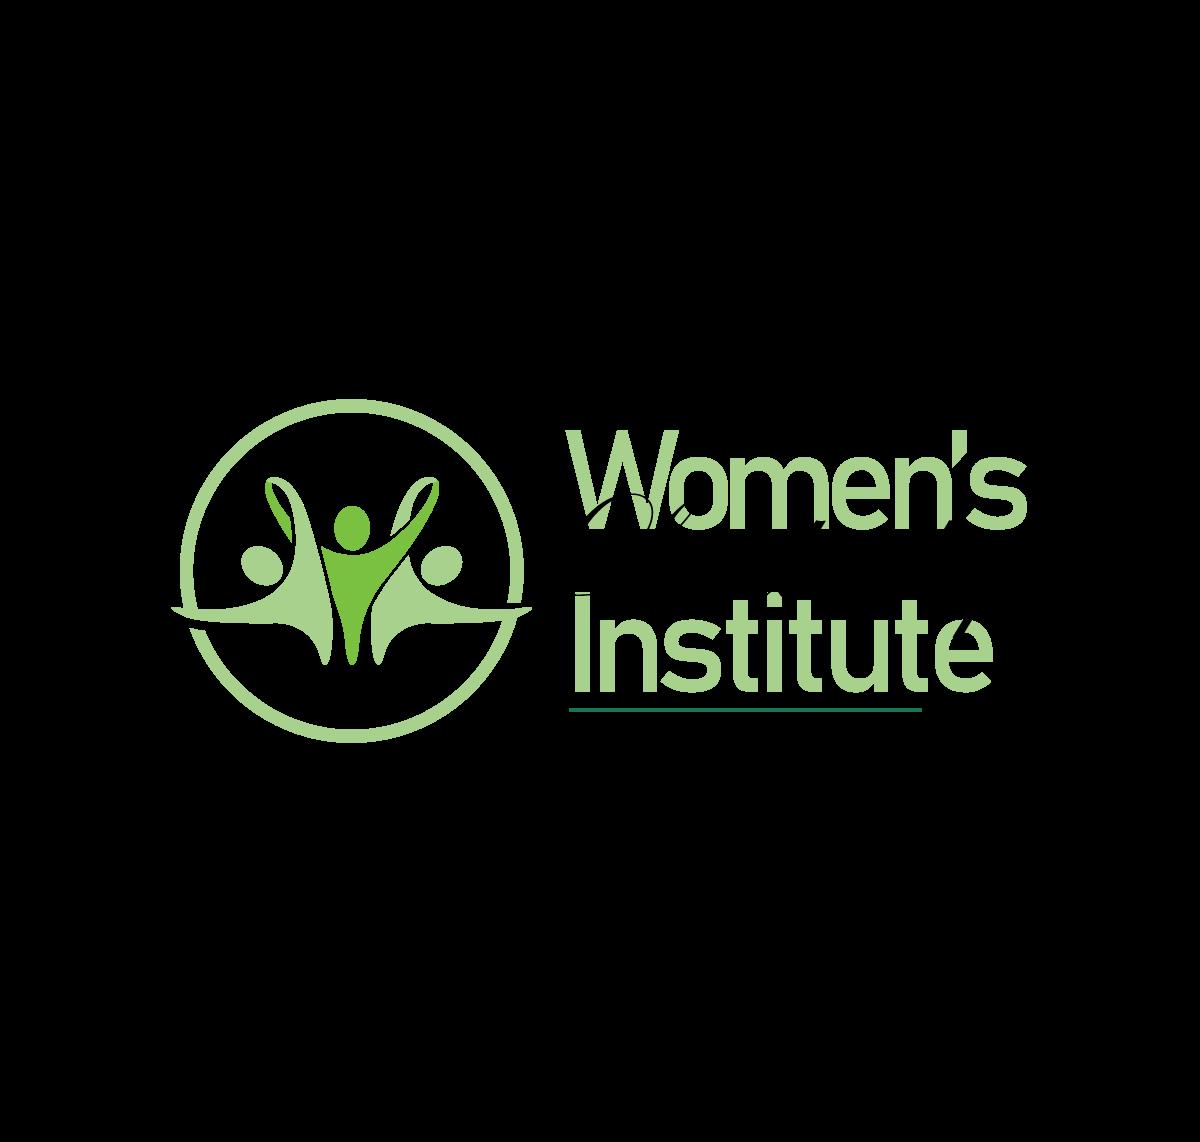 https://higdoncenter.cofc.edu/student-leadership-programs/womens-leadership-conference-logo